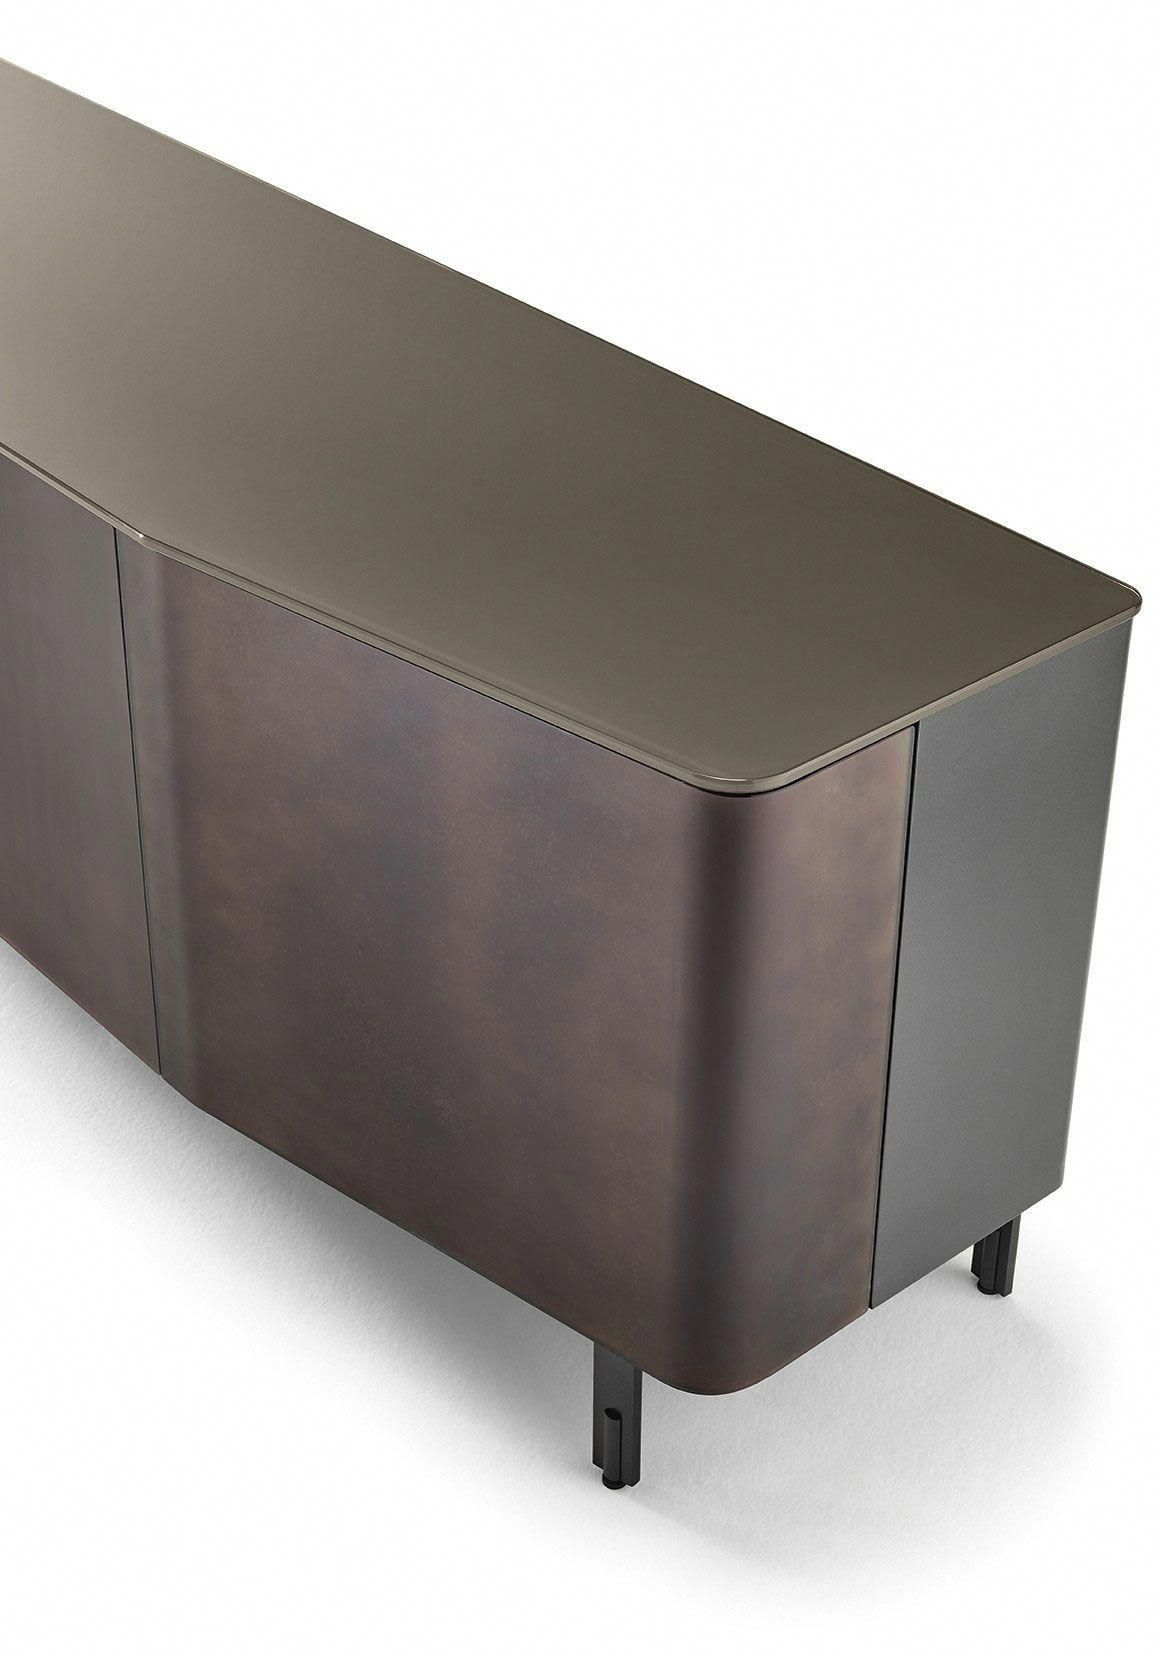 Plana sideboard designed by studio klass for fiam italia 2018 new collection linea inc modern furniture los angeles infolinea inc com homedecor